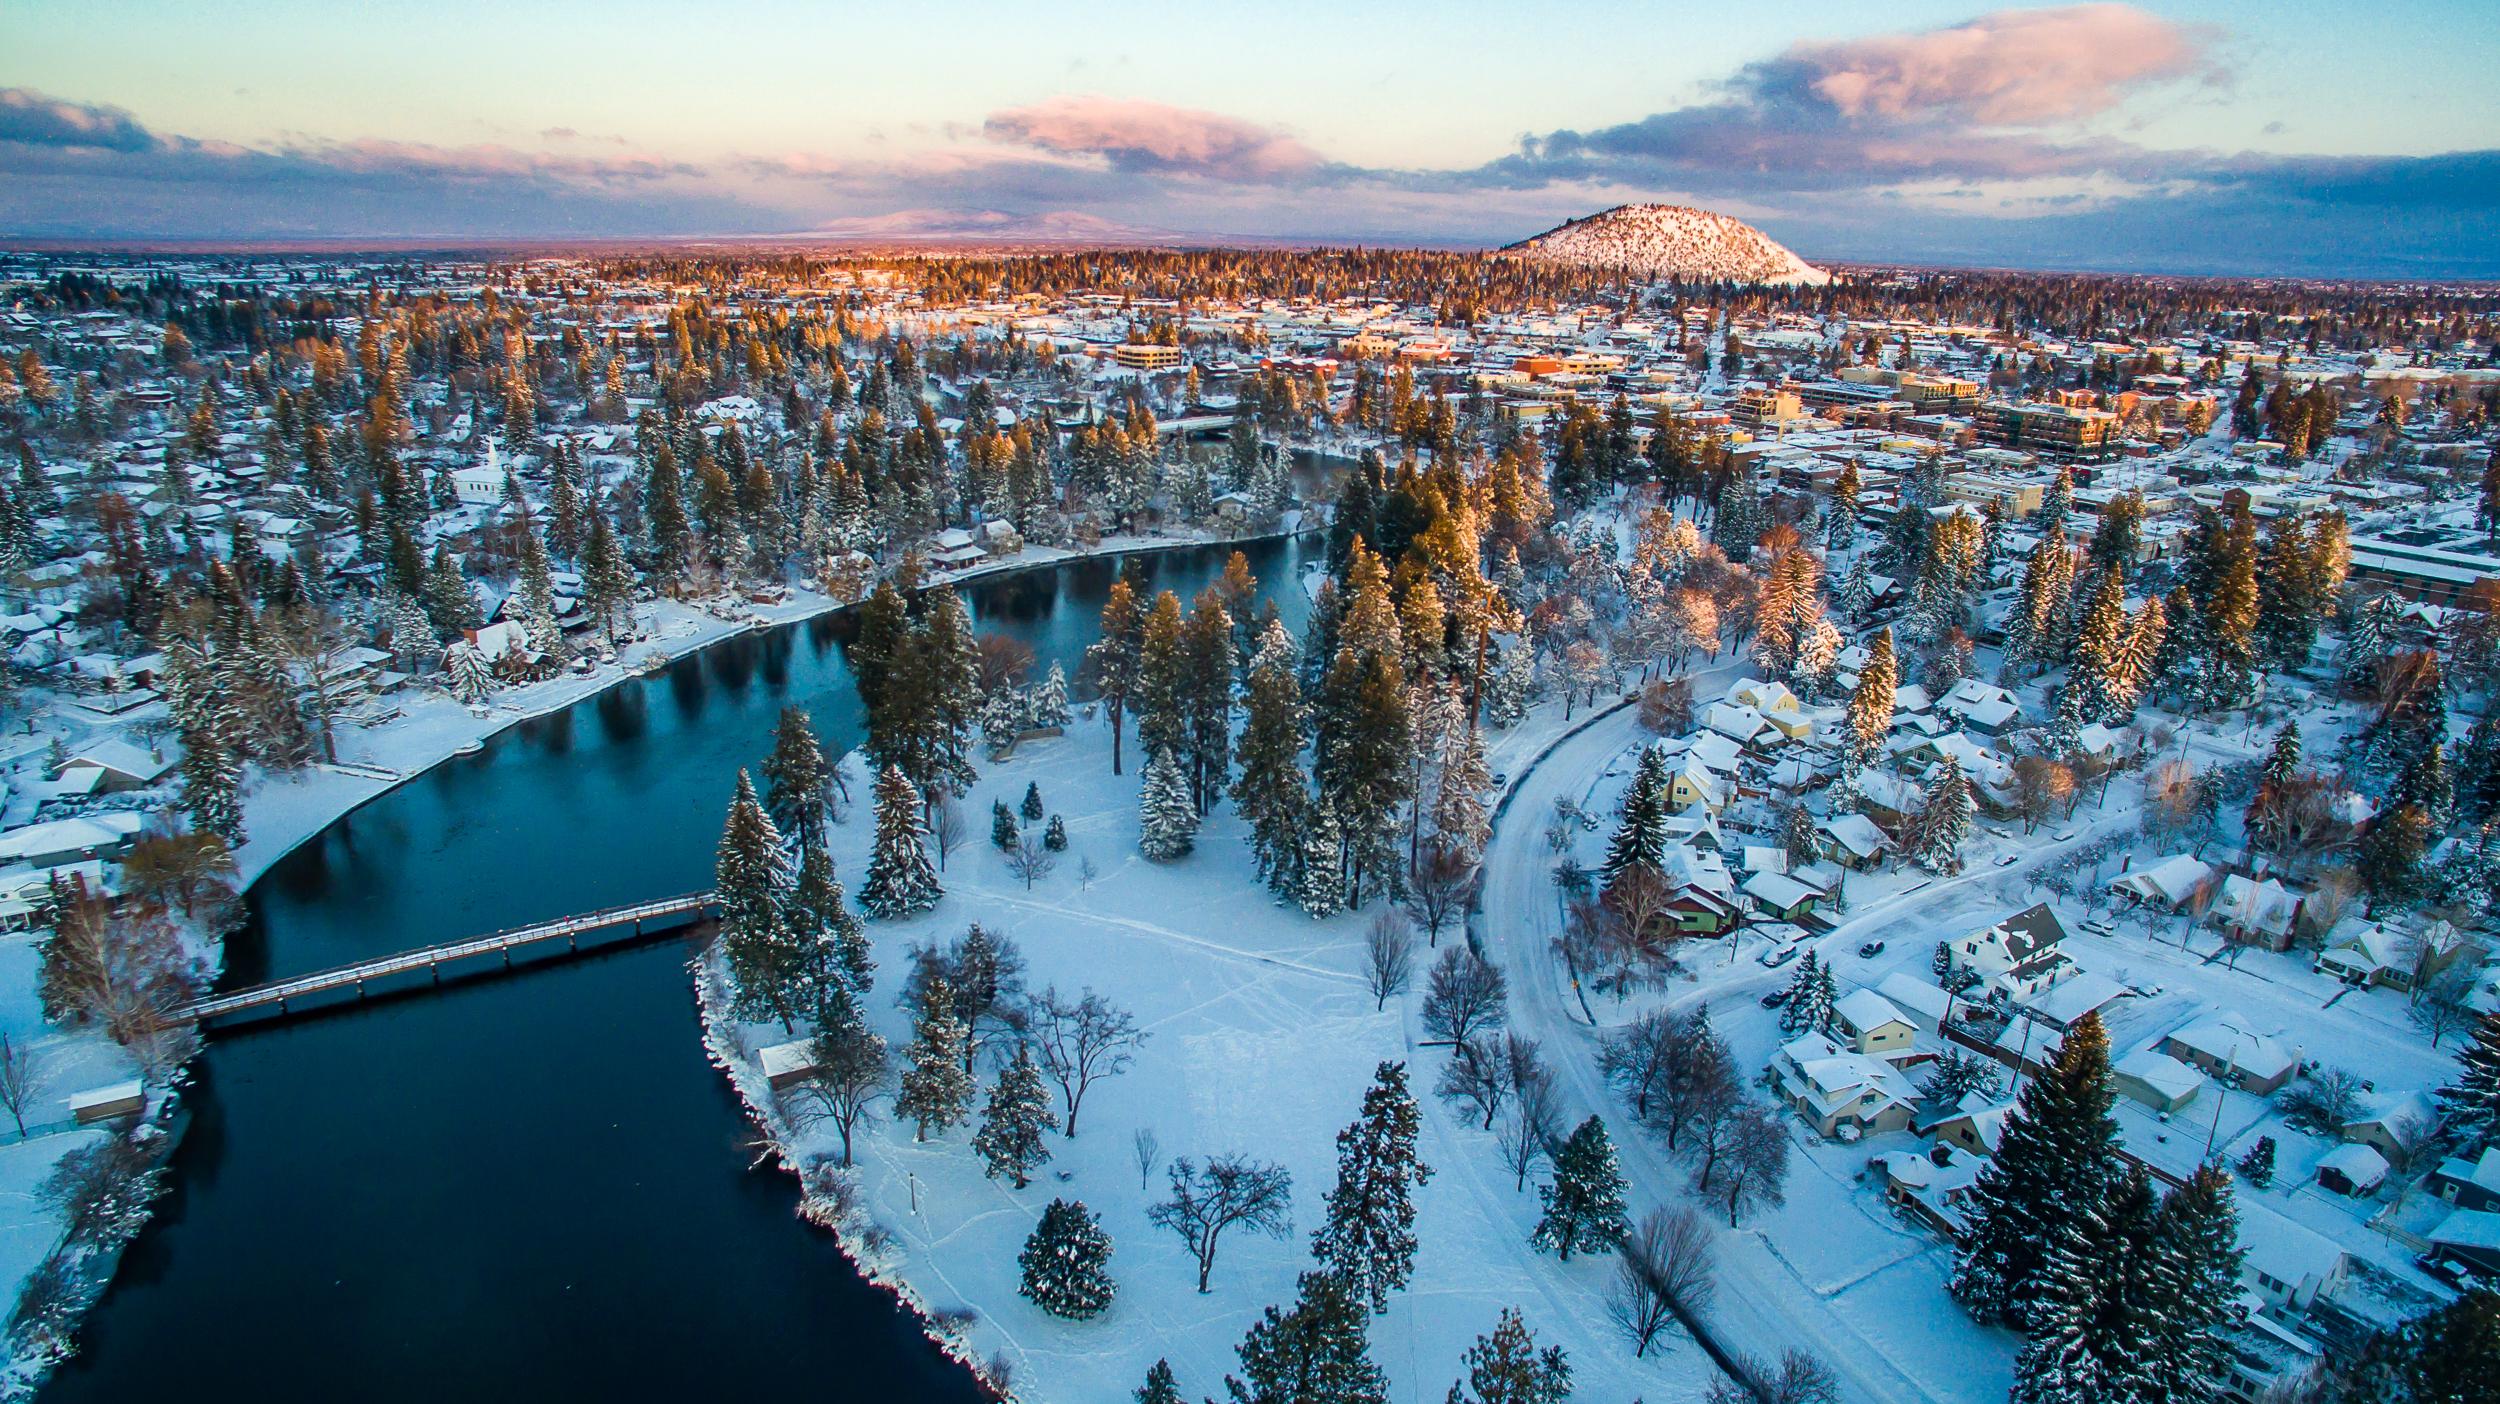 Drake-Park-Bend-Oregon-Aerial-Stock.jpg